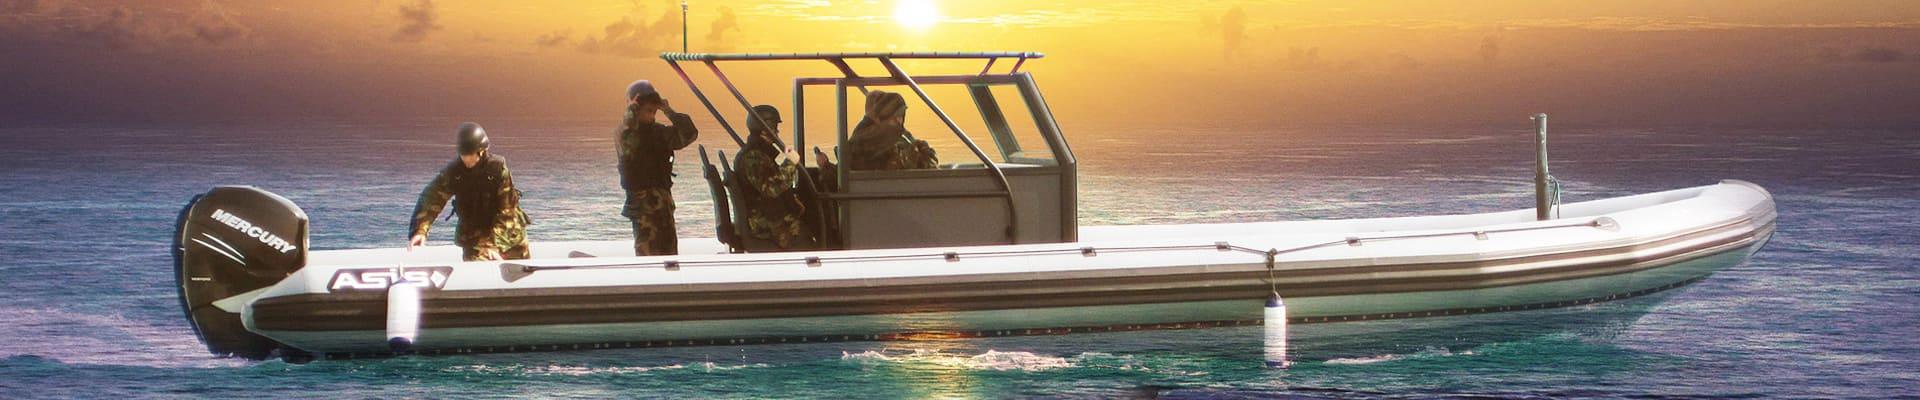 fast-patrol-anti-piracy-boat-12-meter